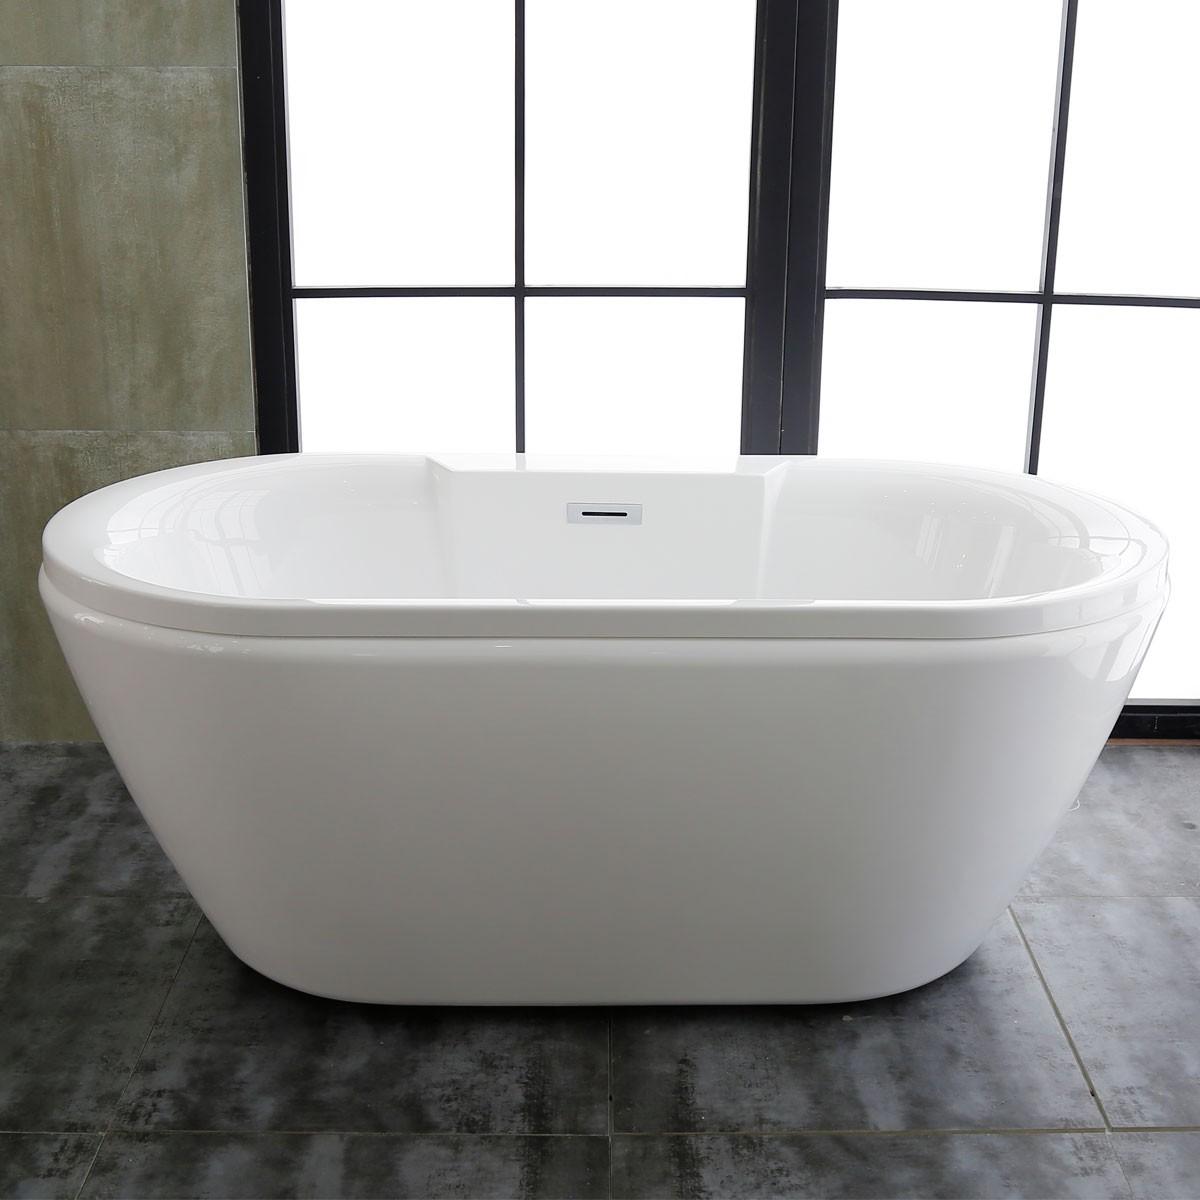 60 In Freestanding Bathtub - Acrylic Pure White (DK-PW-58576)